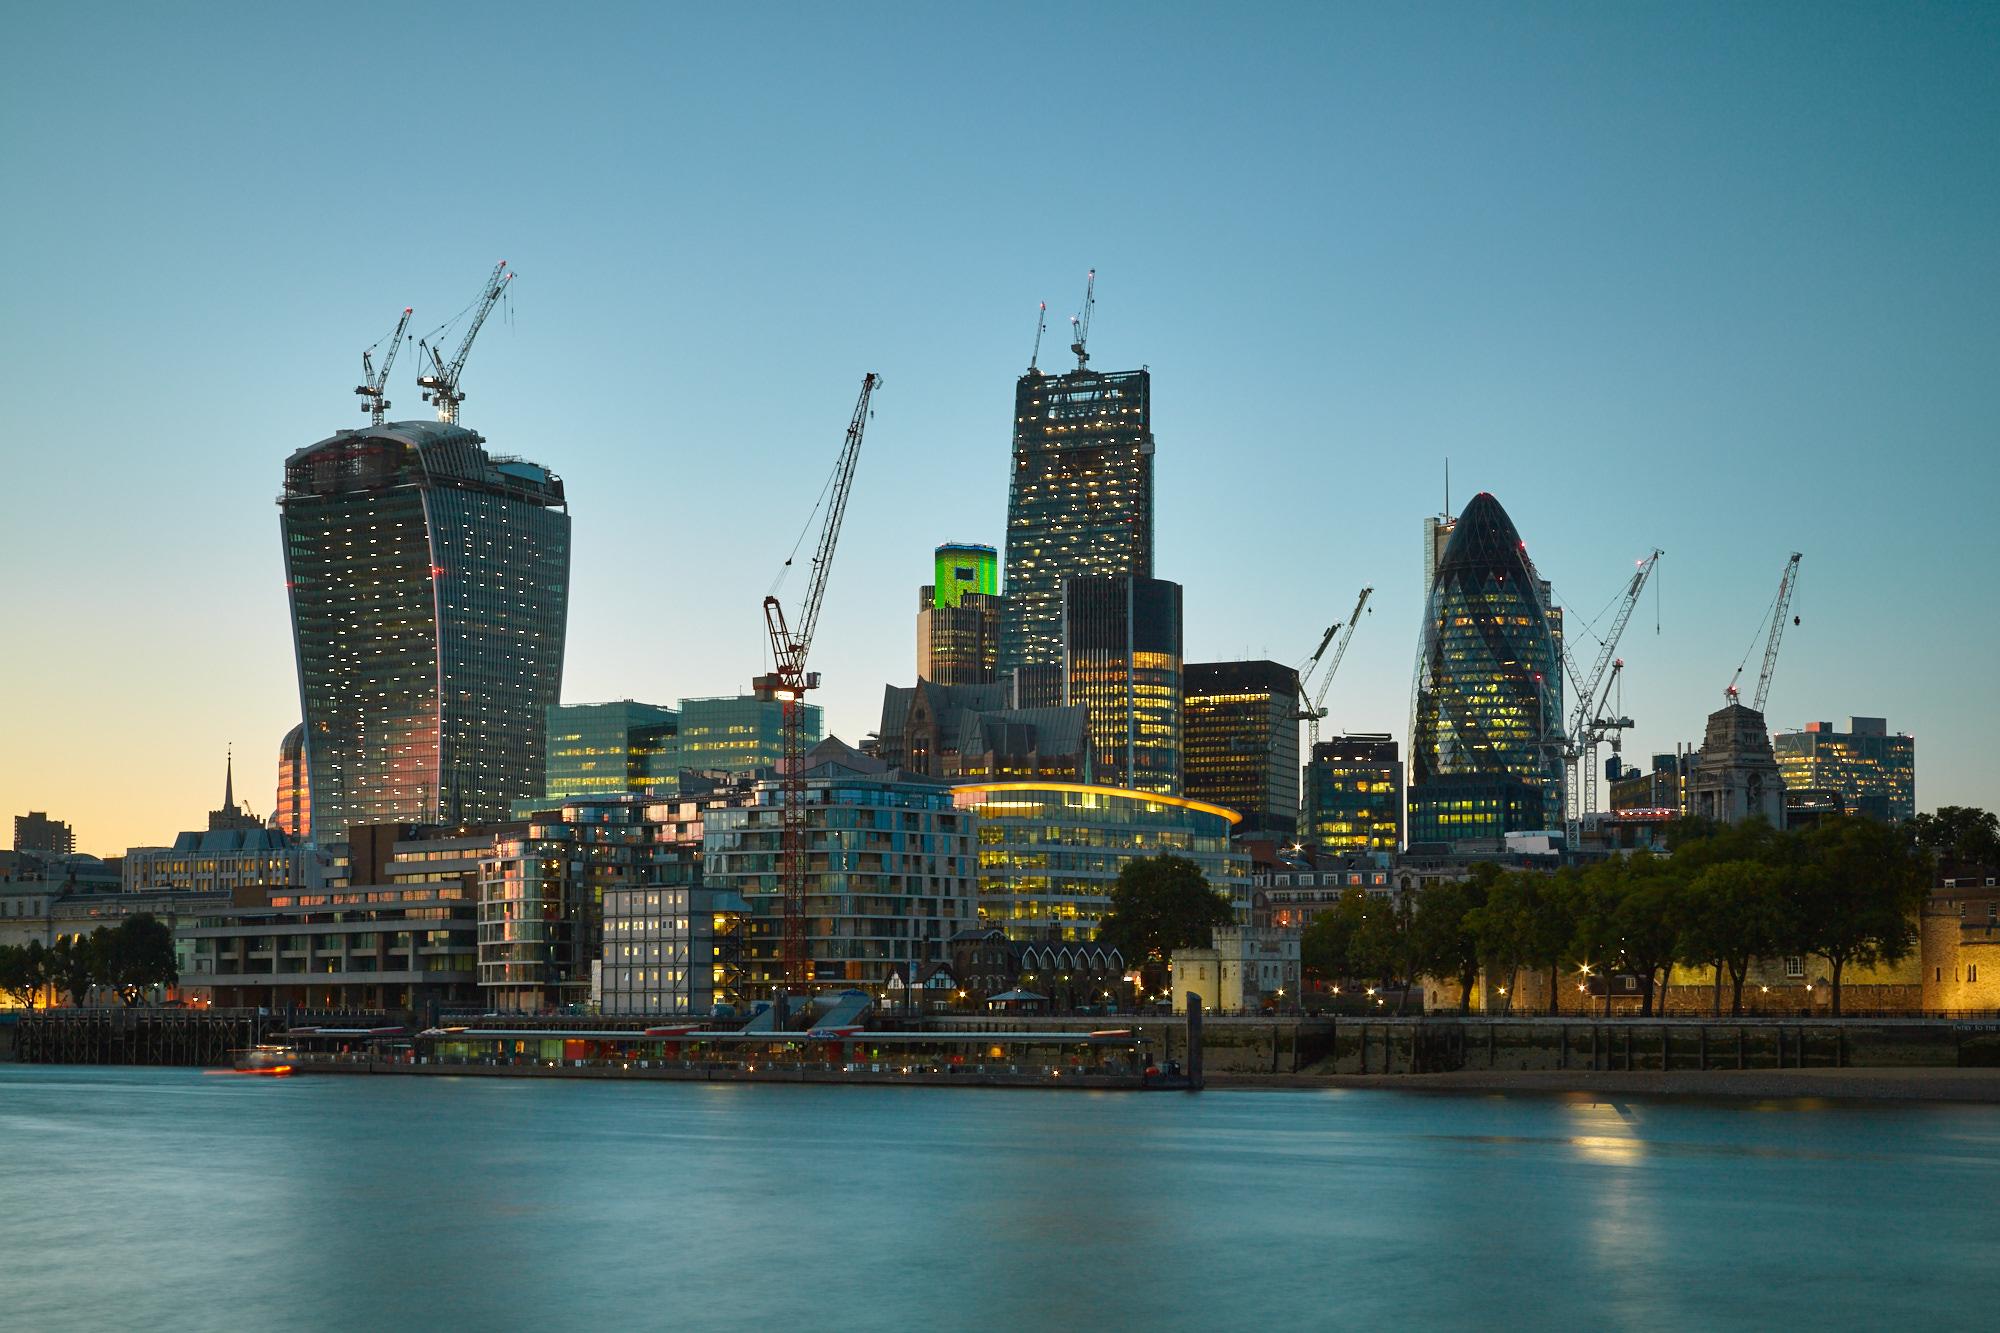 City of London, 2013